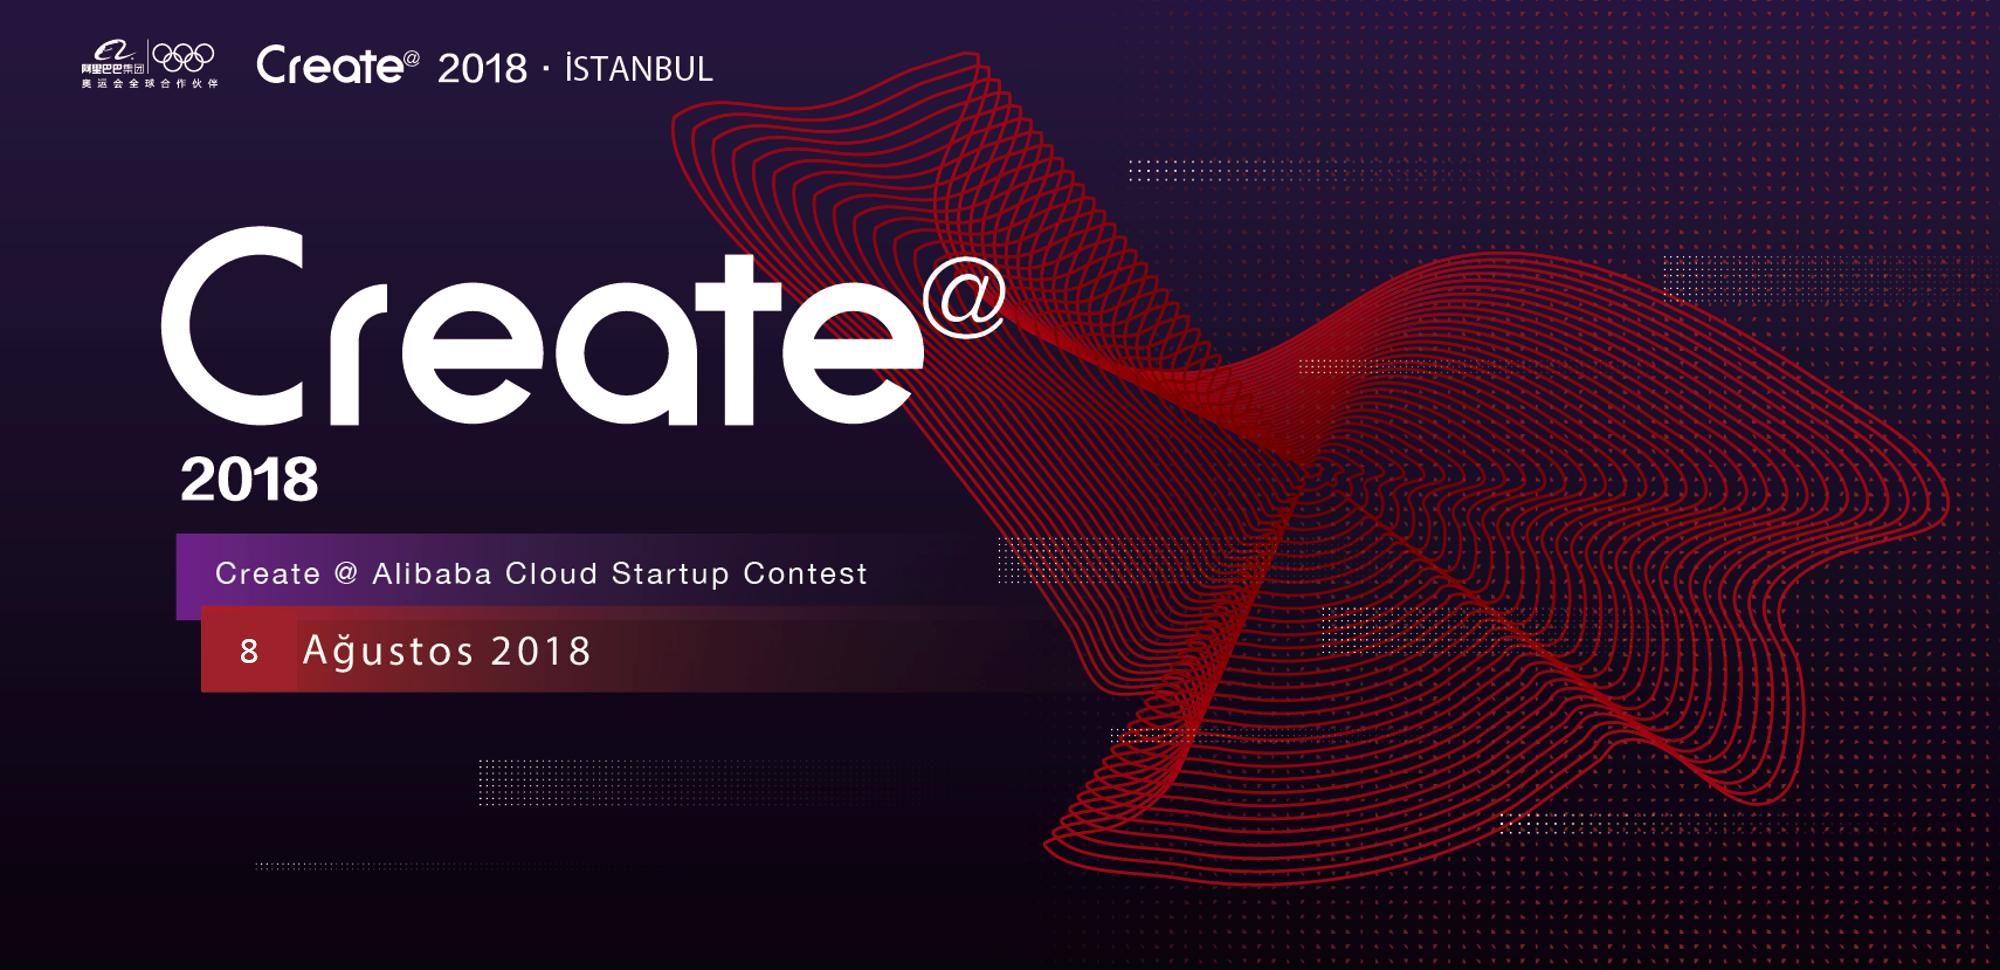 2018 Create@ Alibaba Cloud Startup Contest - Istanbul Turkey